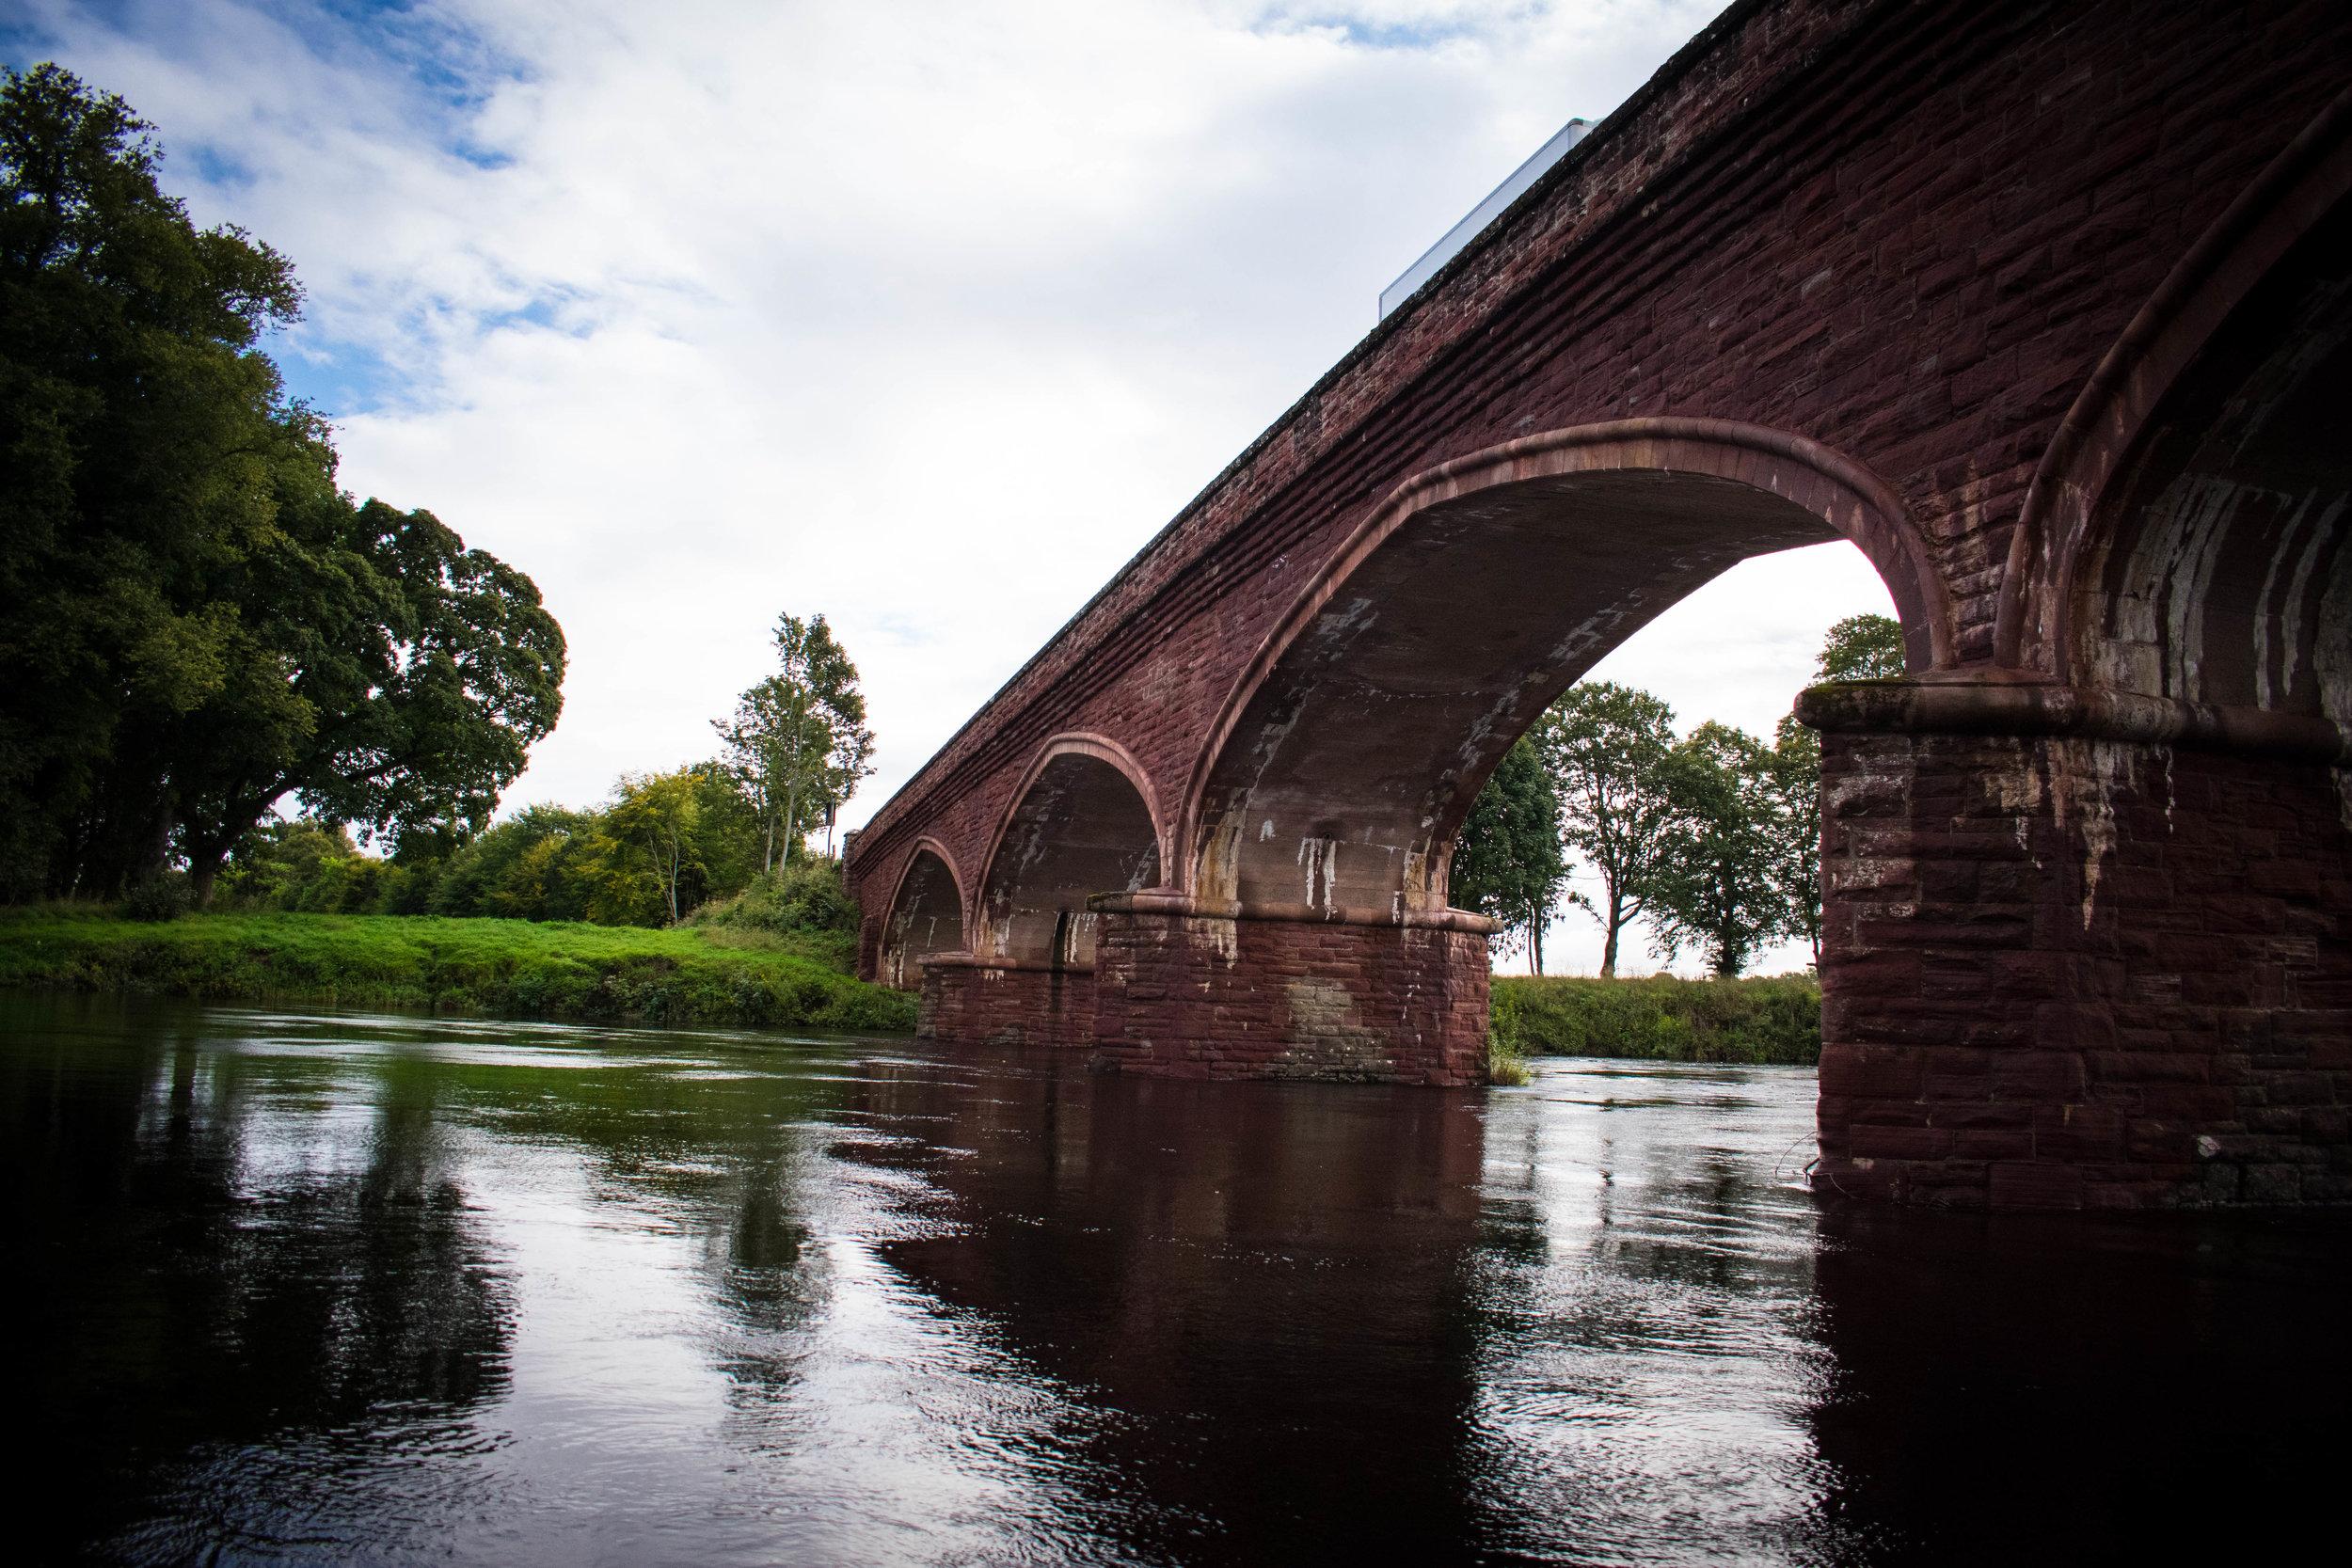 Kinclaven Bridge, Scotland